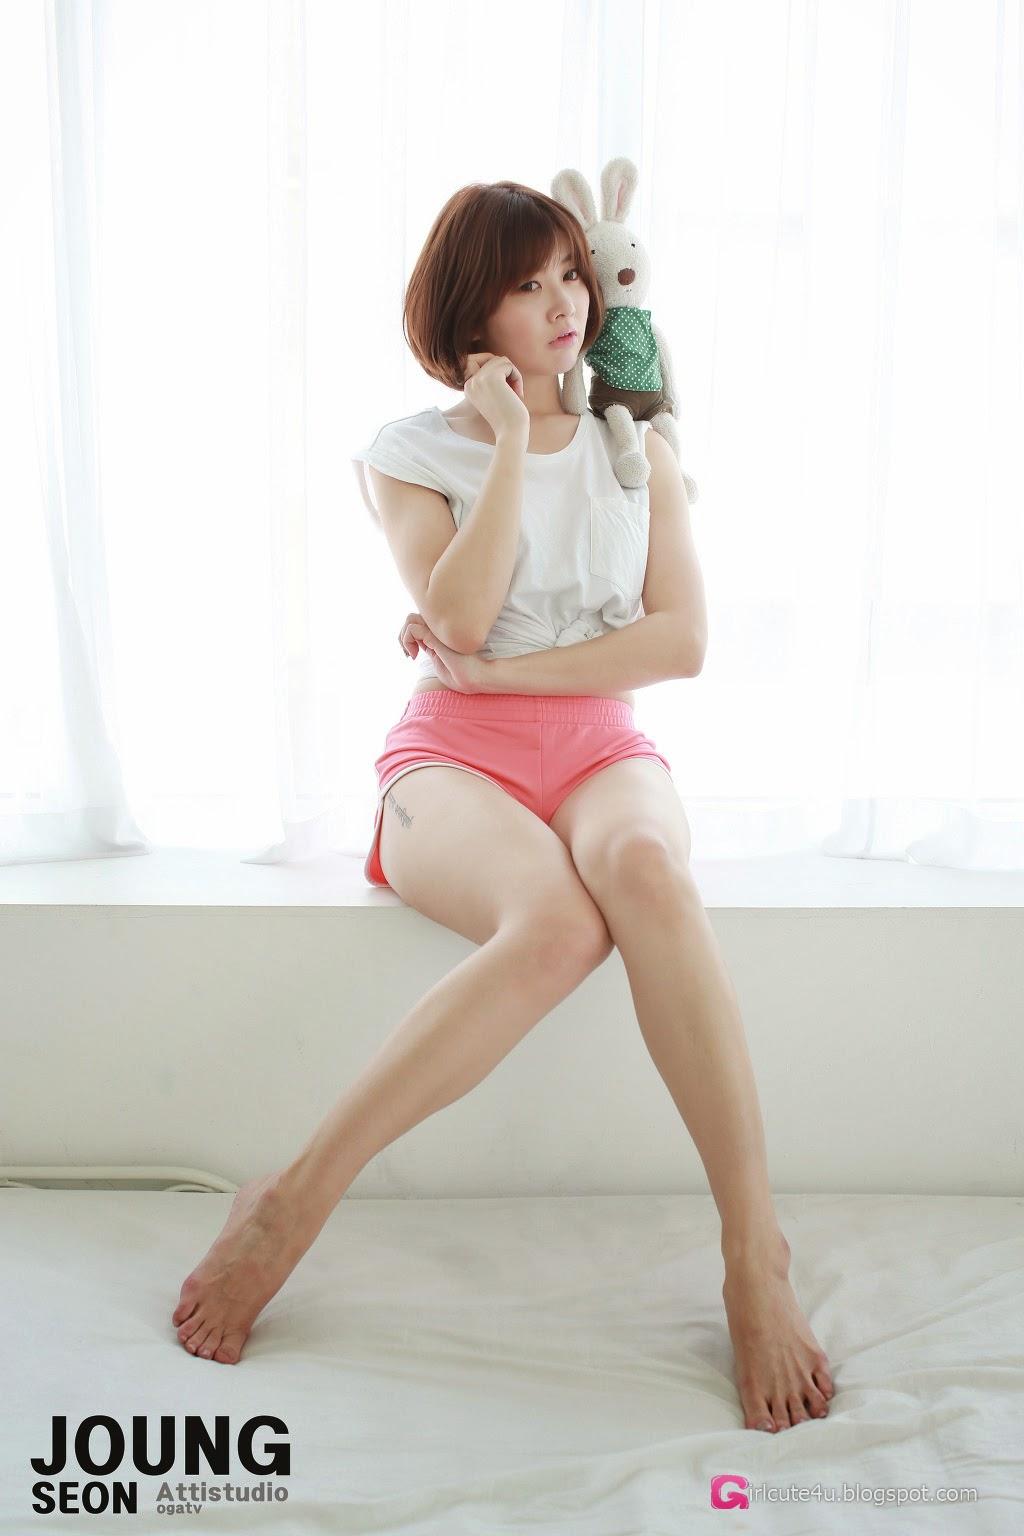 4 Jung Se On - Three Studio Concepts - very cute asian girl-girlcute4u.blogspot.com